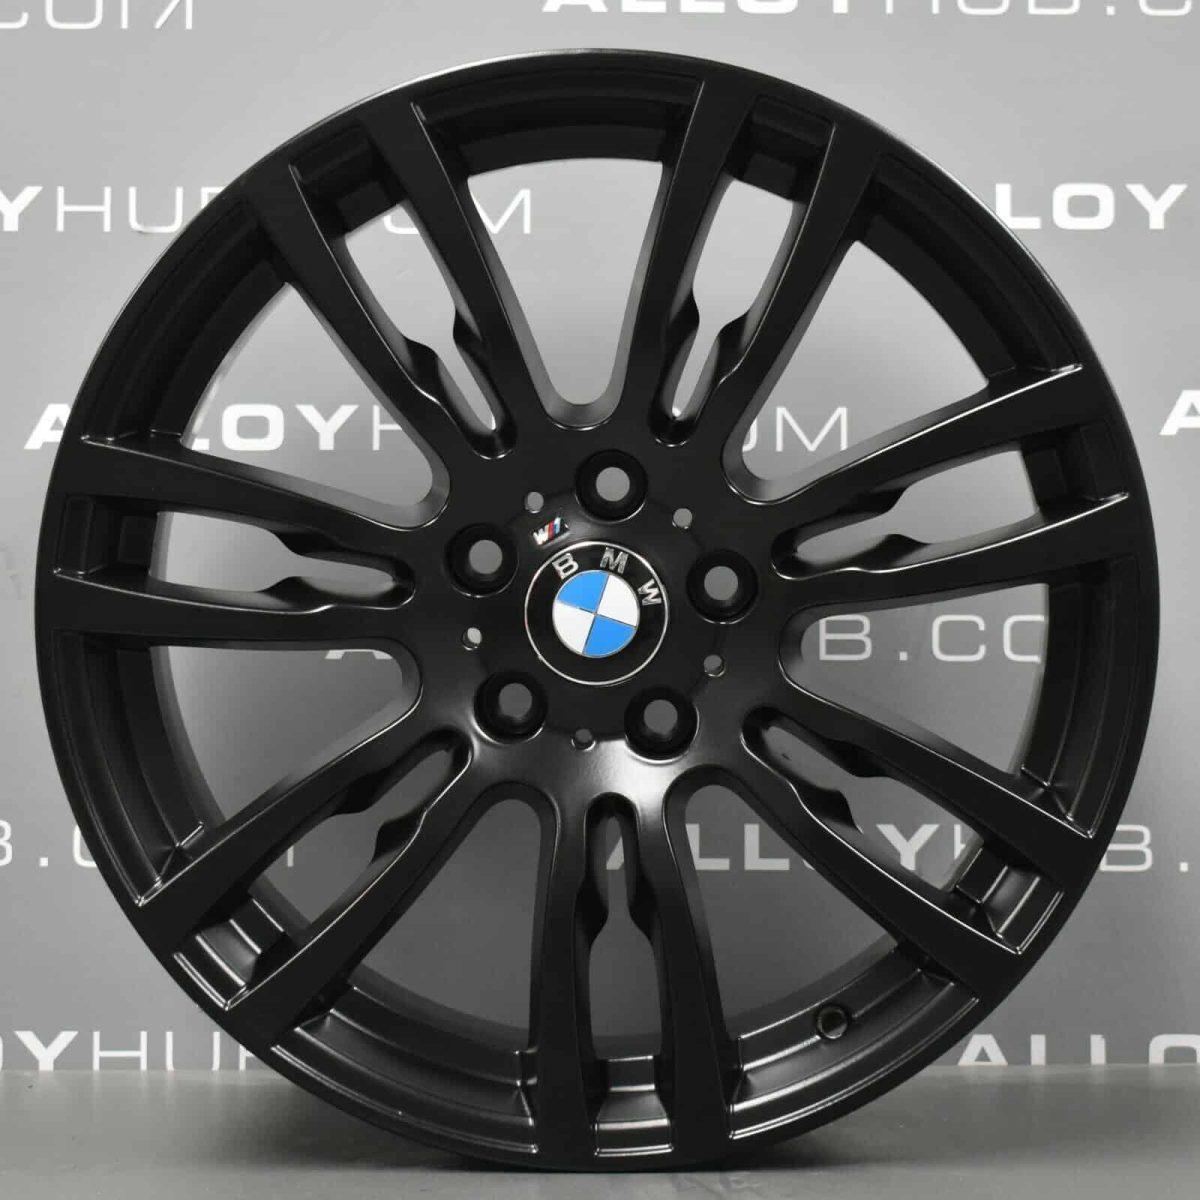 Genuine BMW 3/4 Series Style 403M Sport 19″ Inch Alloy Wheel with Satin Black Finish 36117845882 36117845883